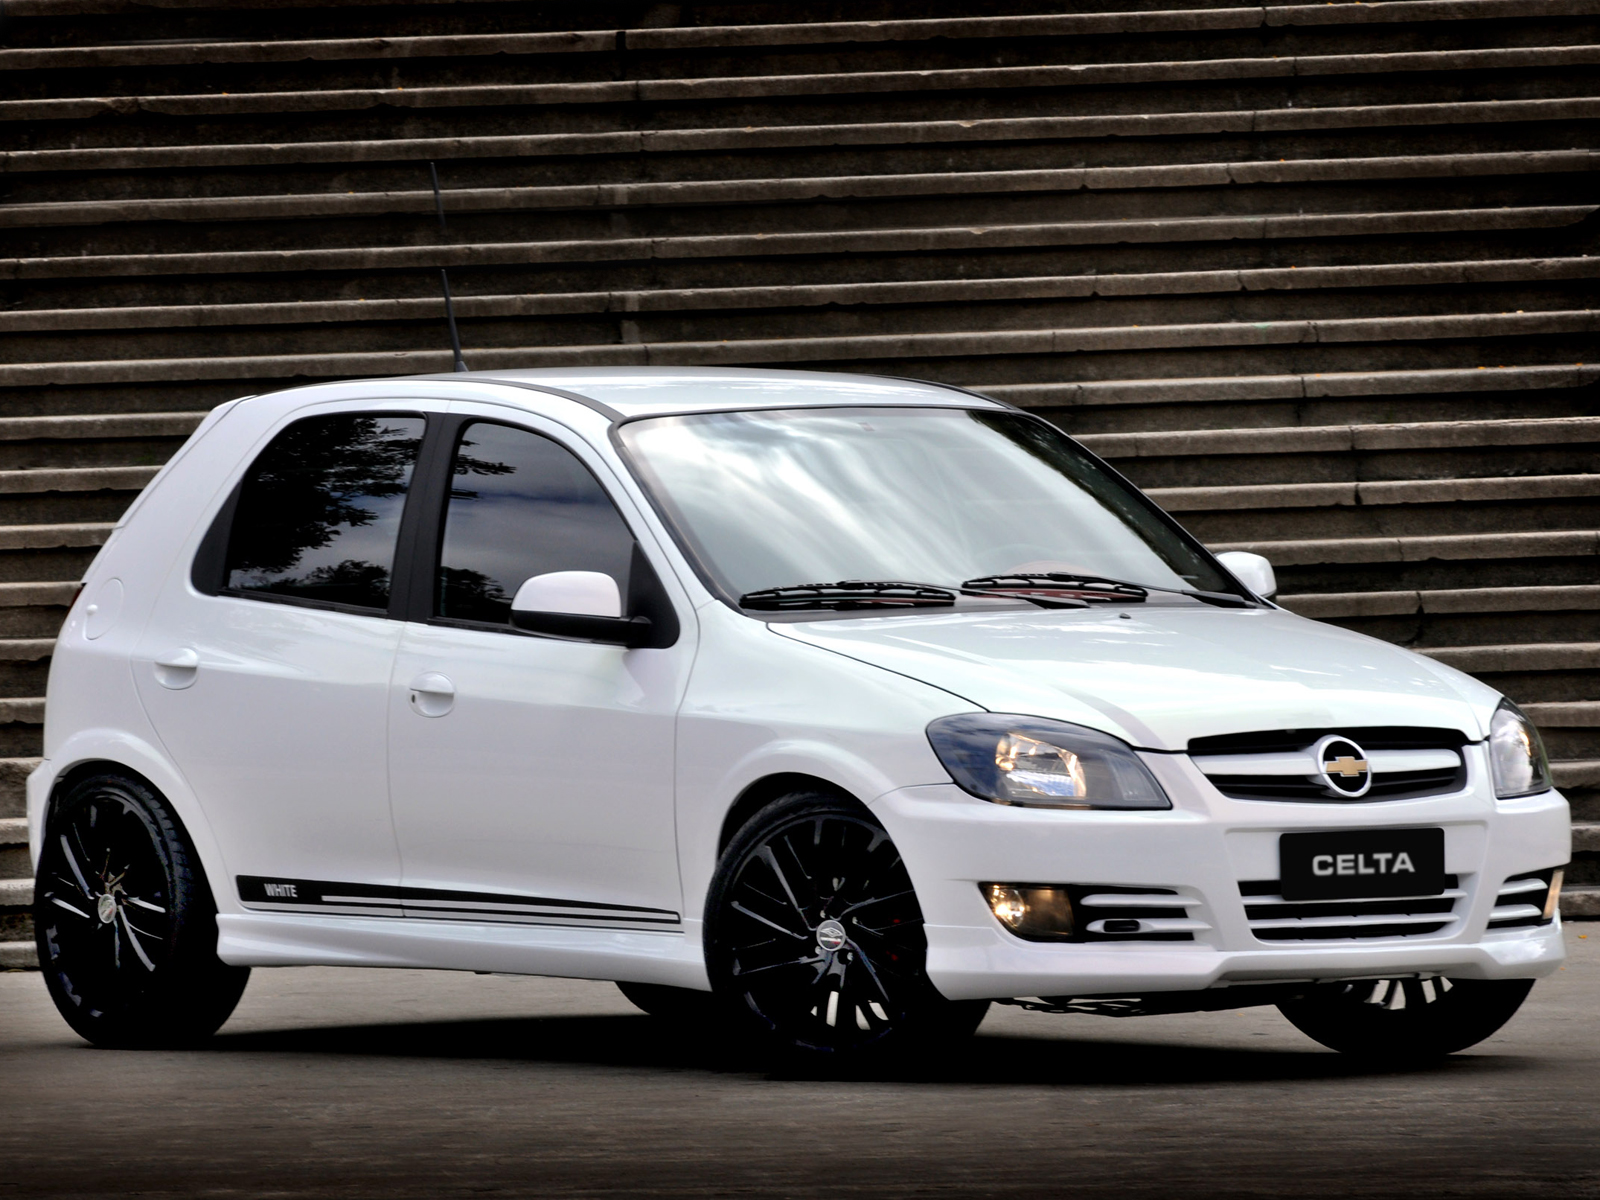 Chevrolet Celta Wallpapers Carros